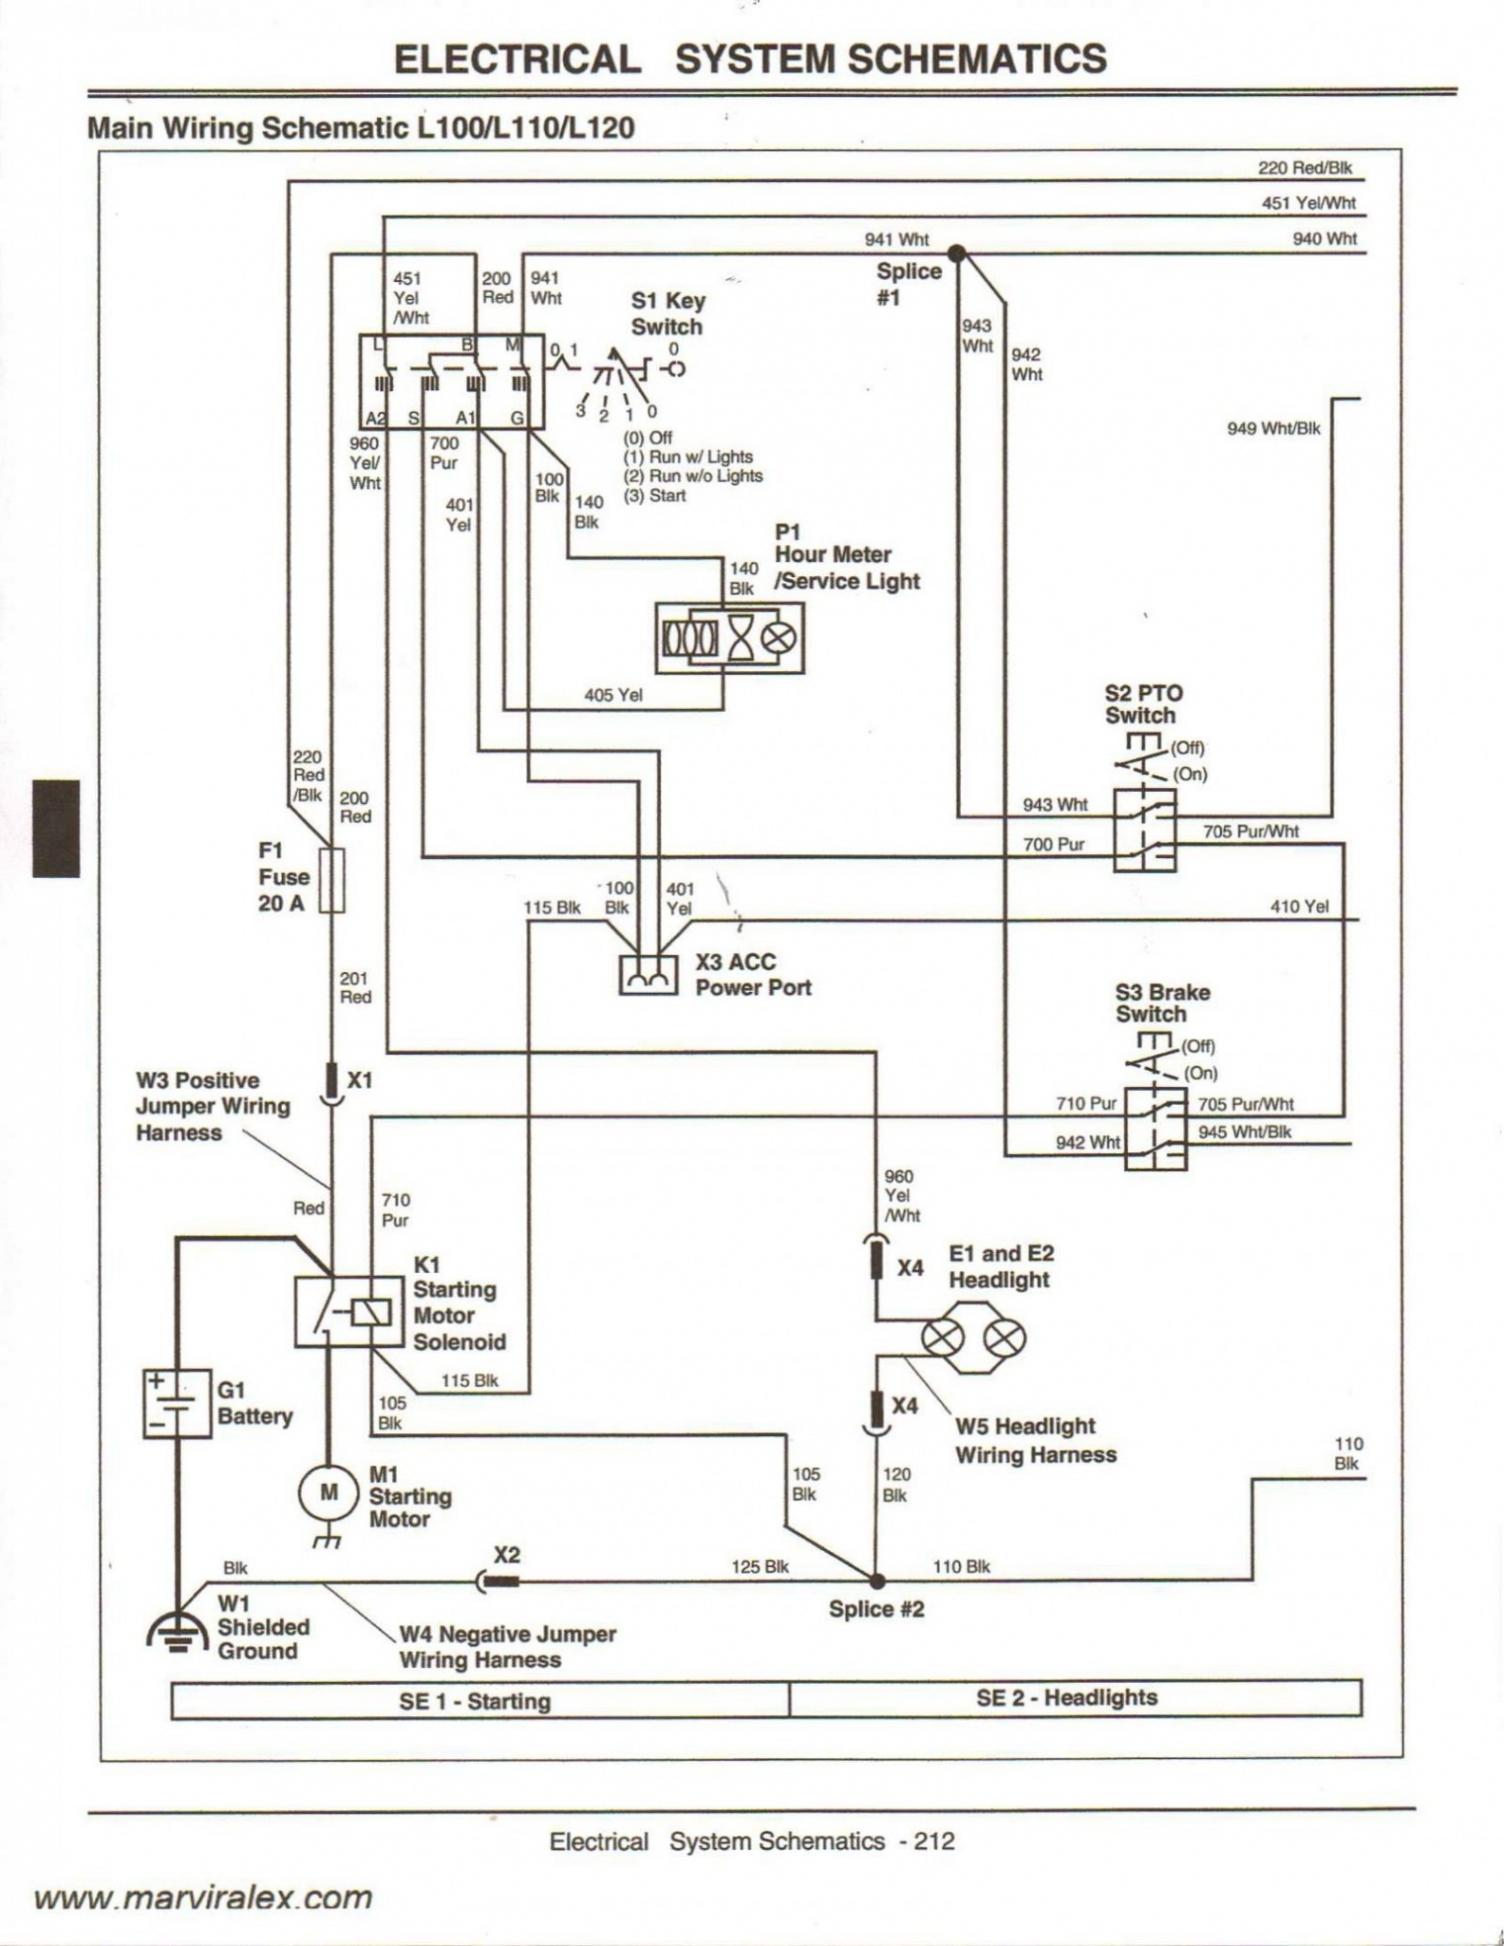 John Deere Lt133 Wiring Diagram | Manual E-Books - John Deere Lt133 Wiring Diagram